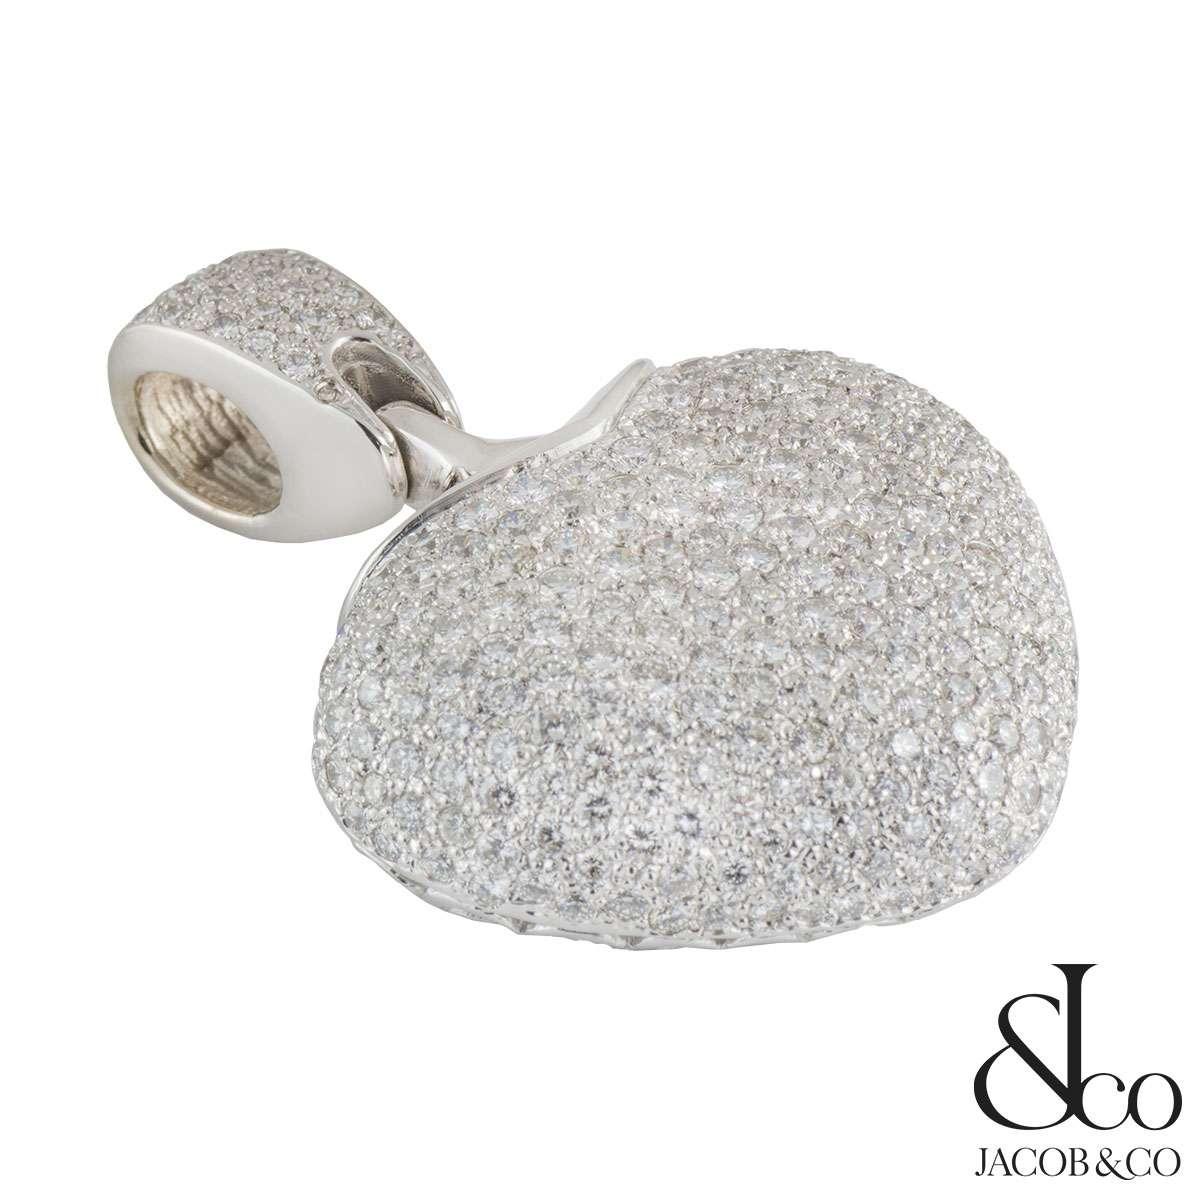 Jacob & Co White Gold Diamond Heart Pendant